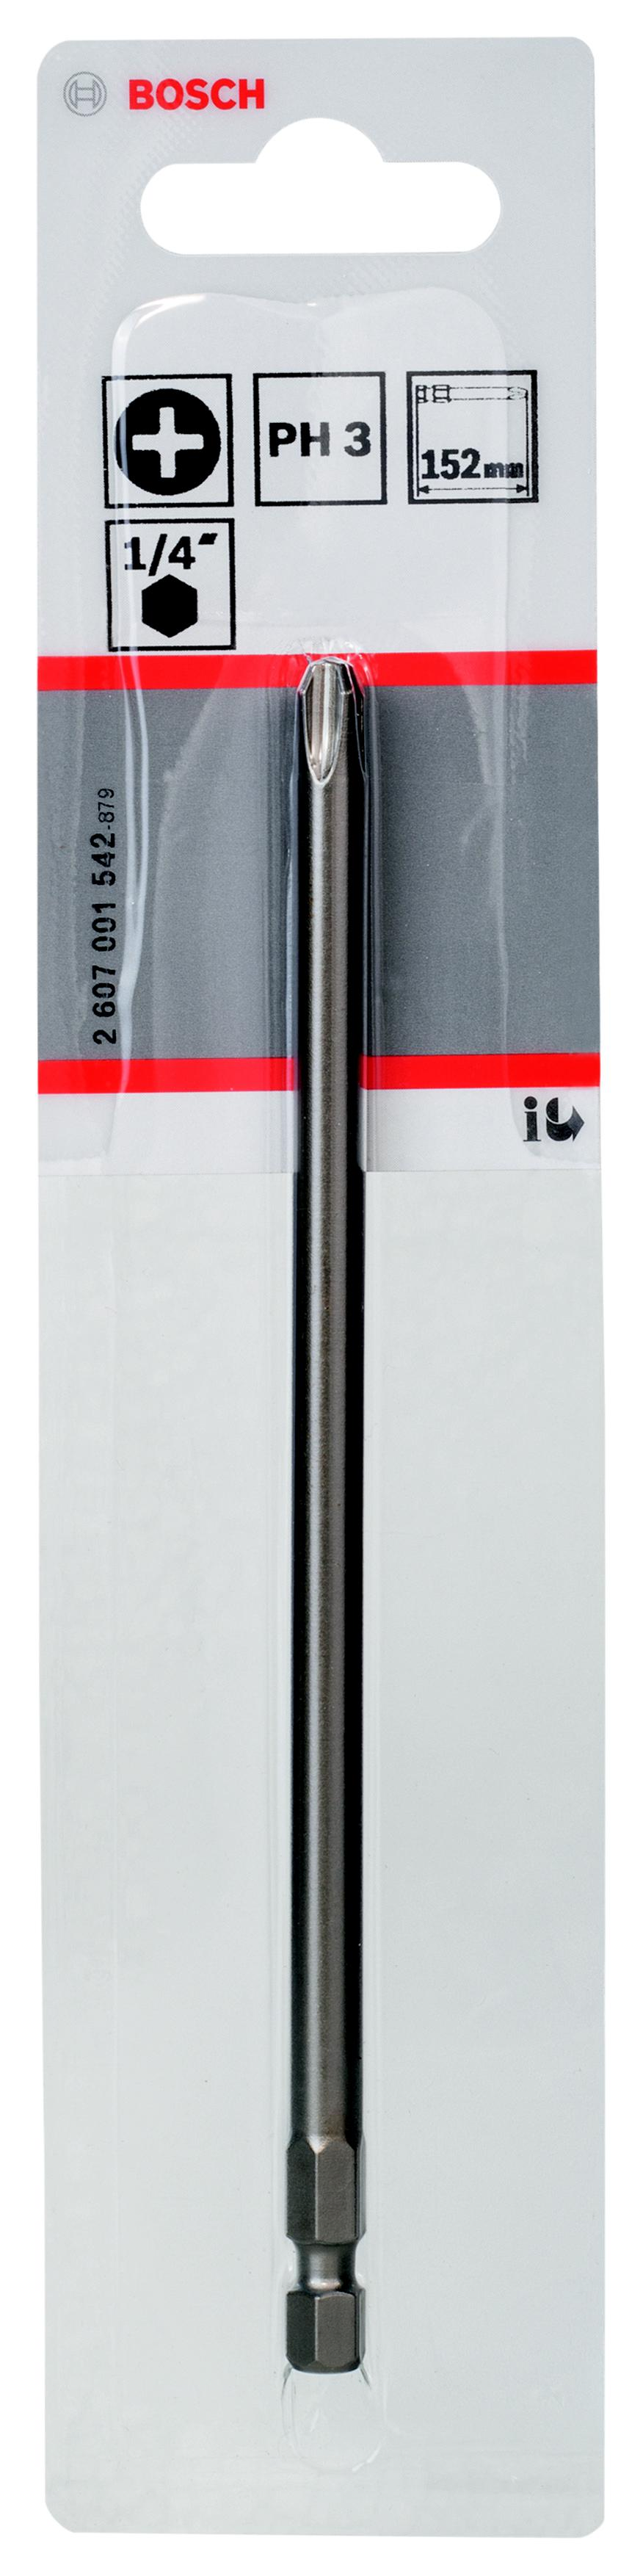 Бита Bosch Extra-hart ph3 152 мм, 1 шт. (2.607.001.542)